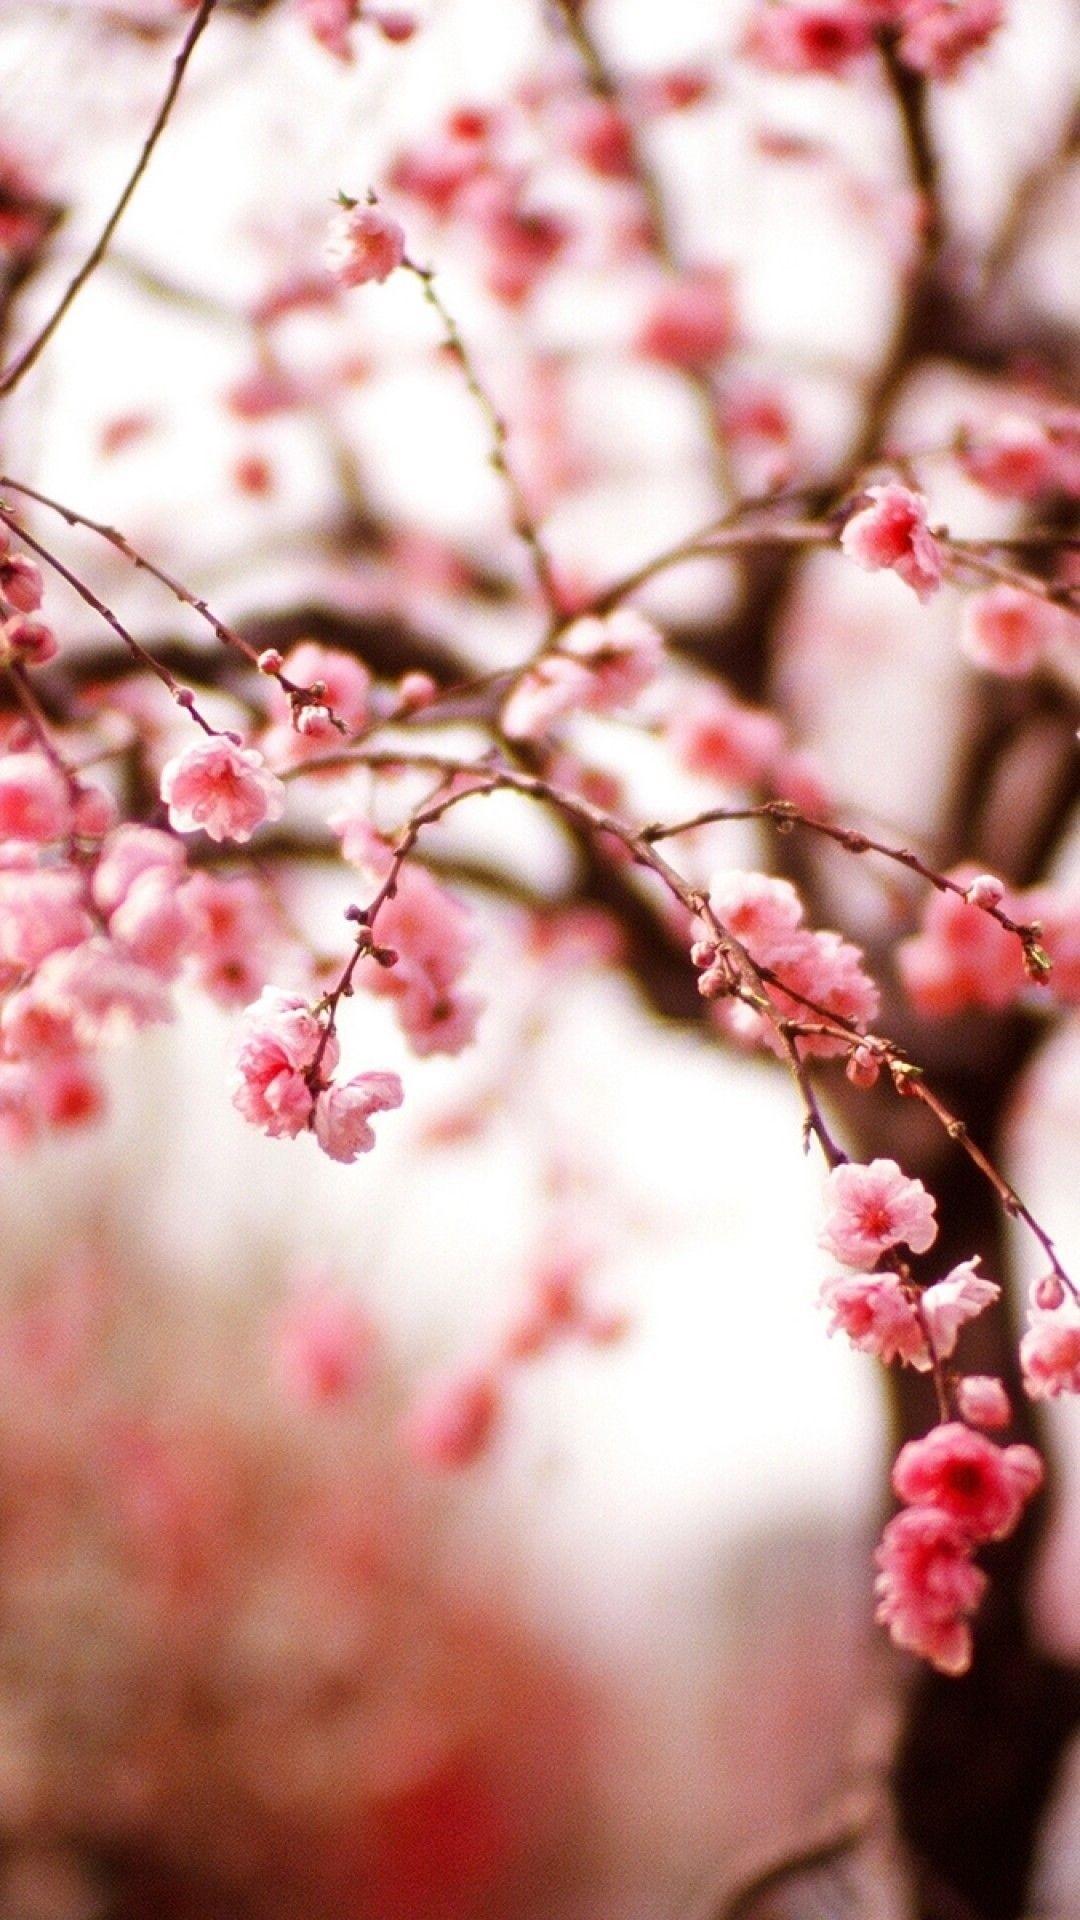 Cherry Blossom iphone 7 wallpaper